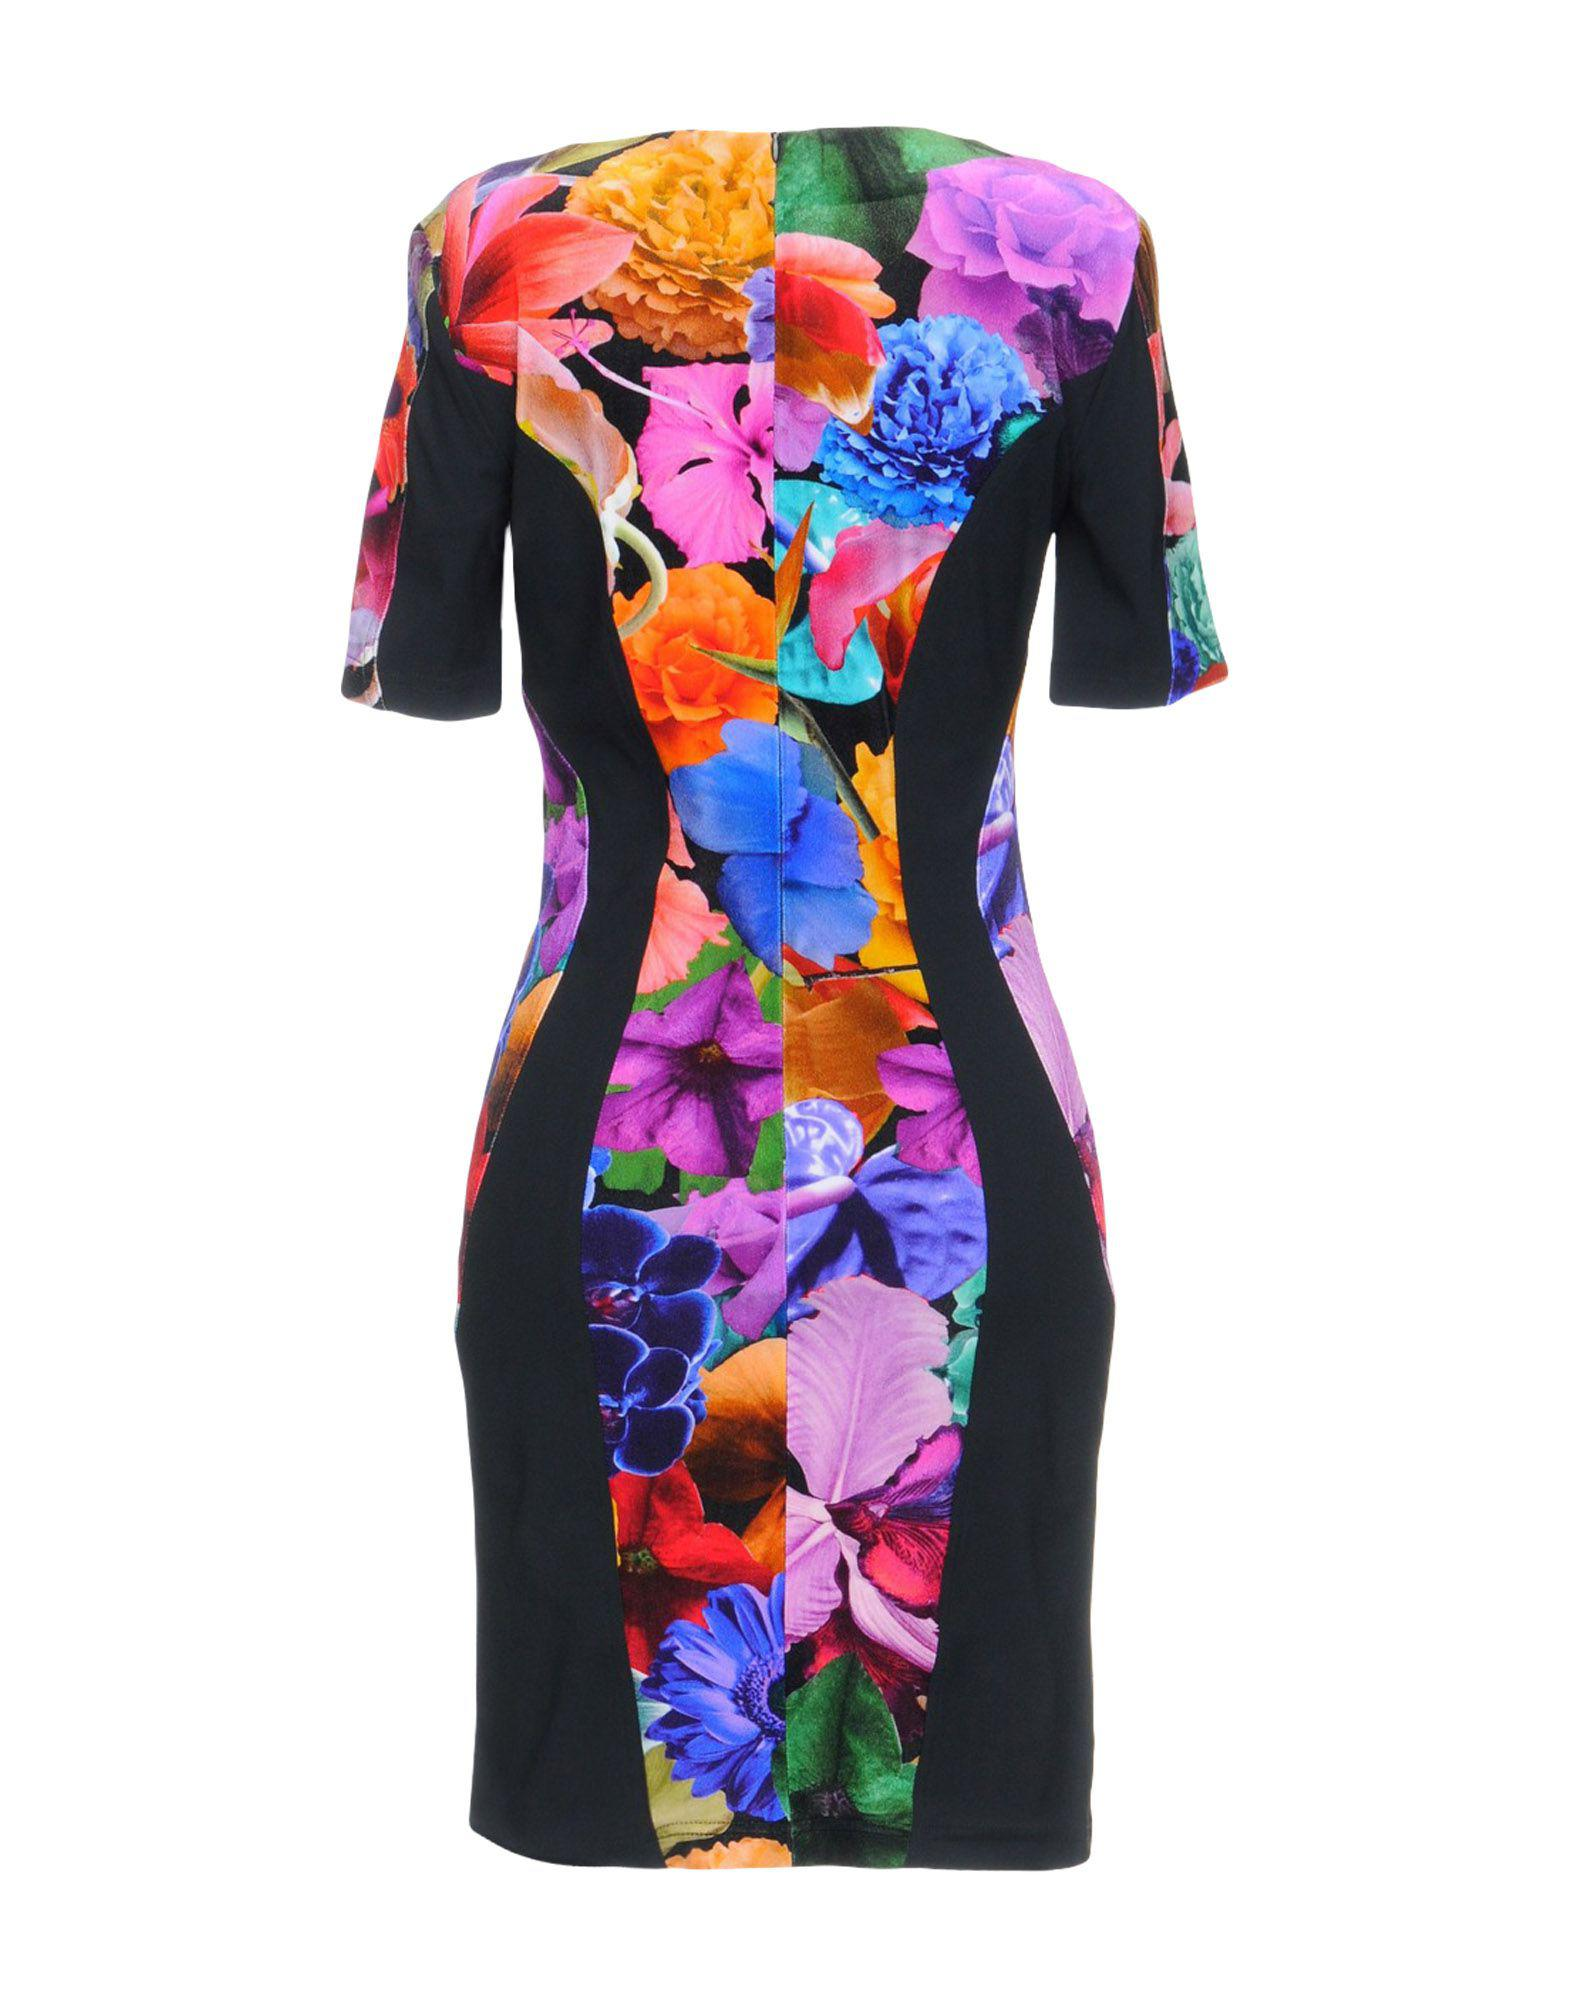 Black In Wash Lyst Irie Short Dress qwOnFBA